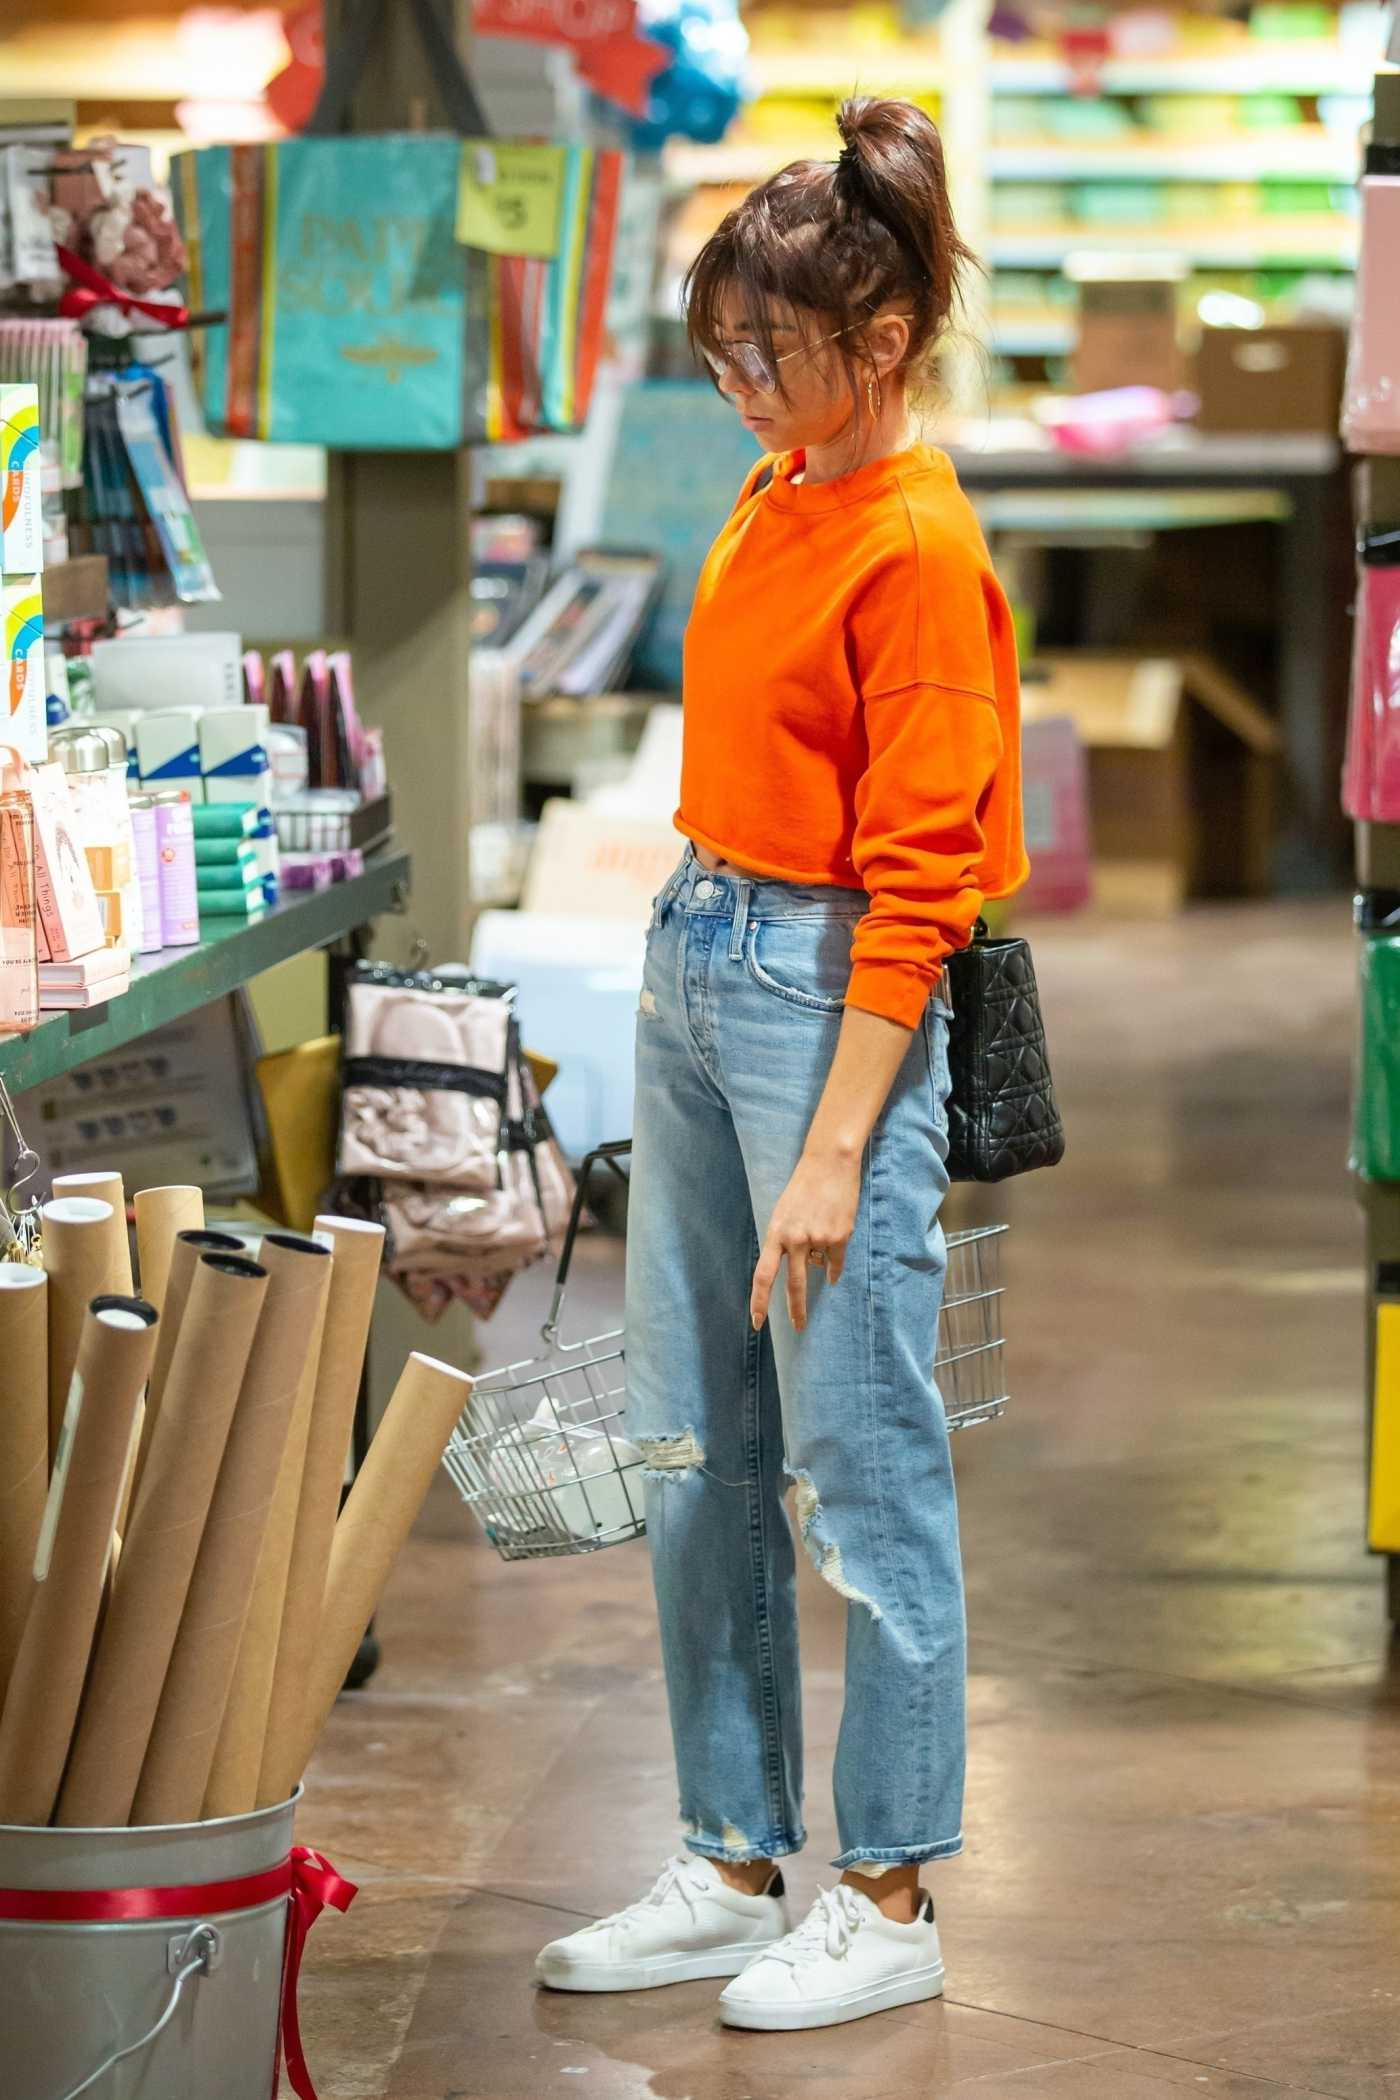 Sarah Hyland in an Orange Cropped Sweatshirt Goes Shopping in Studio City 12/22/2019